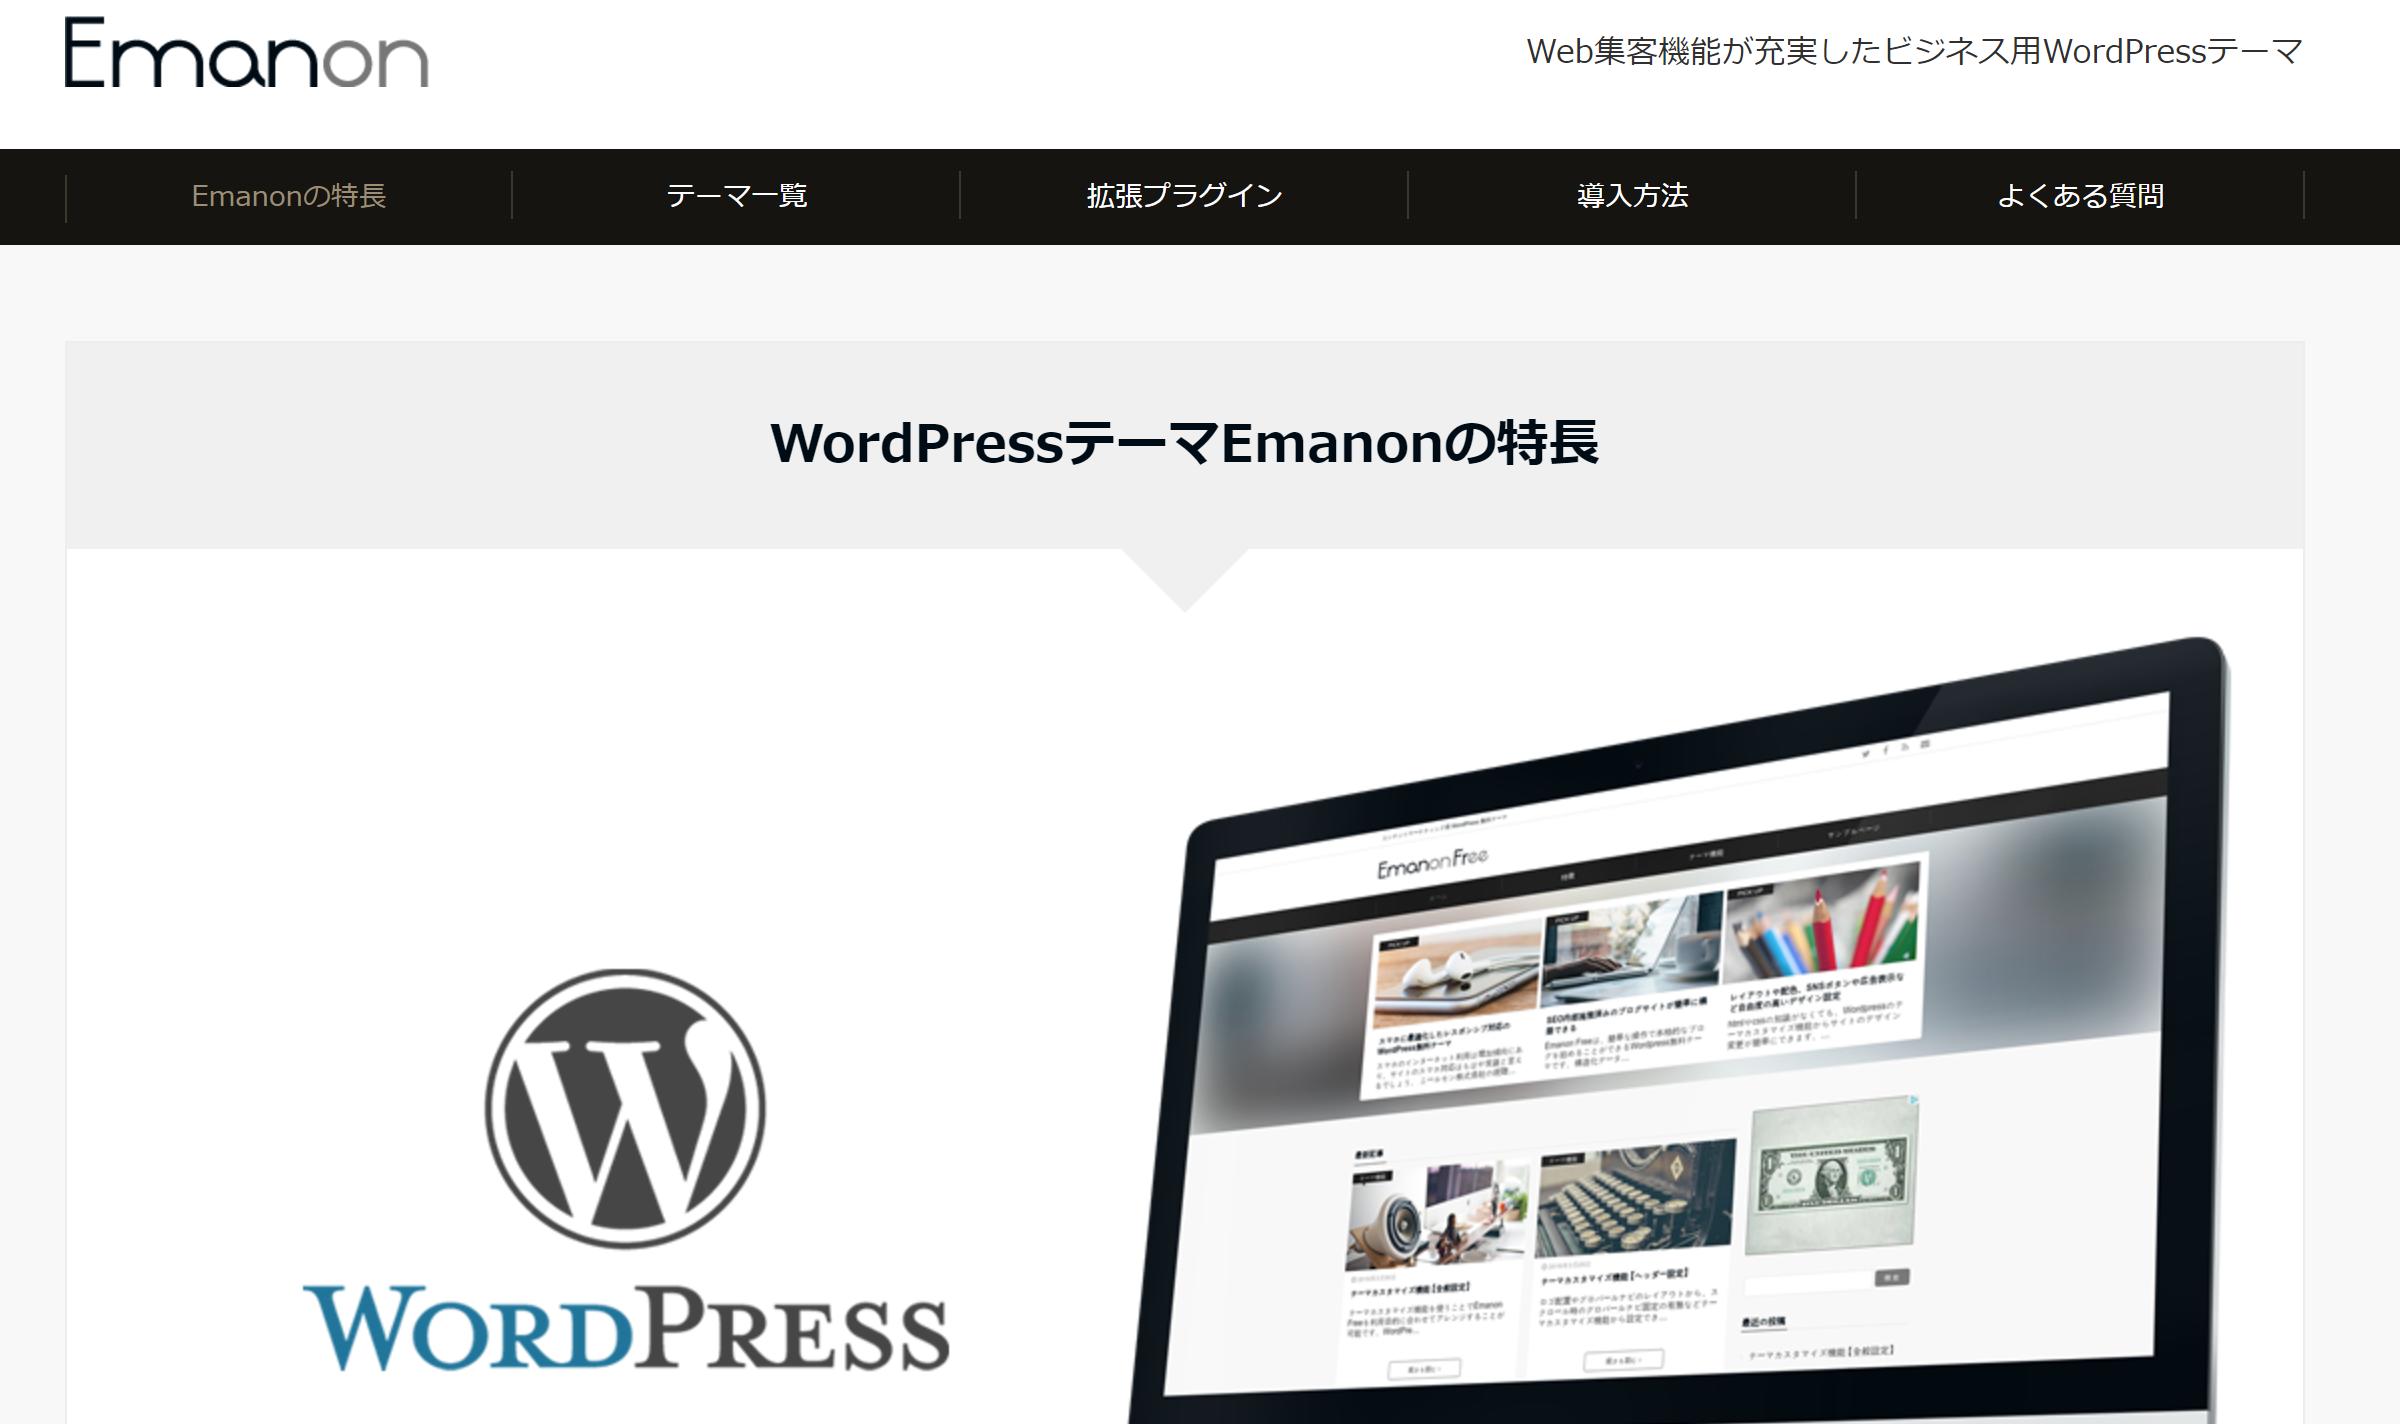 emanon pro - WordPressの有料テーマを使うメリットと初心者におすすめ15選を紹介